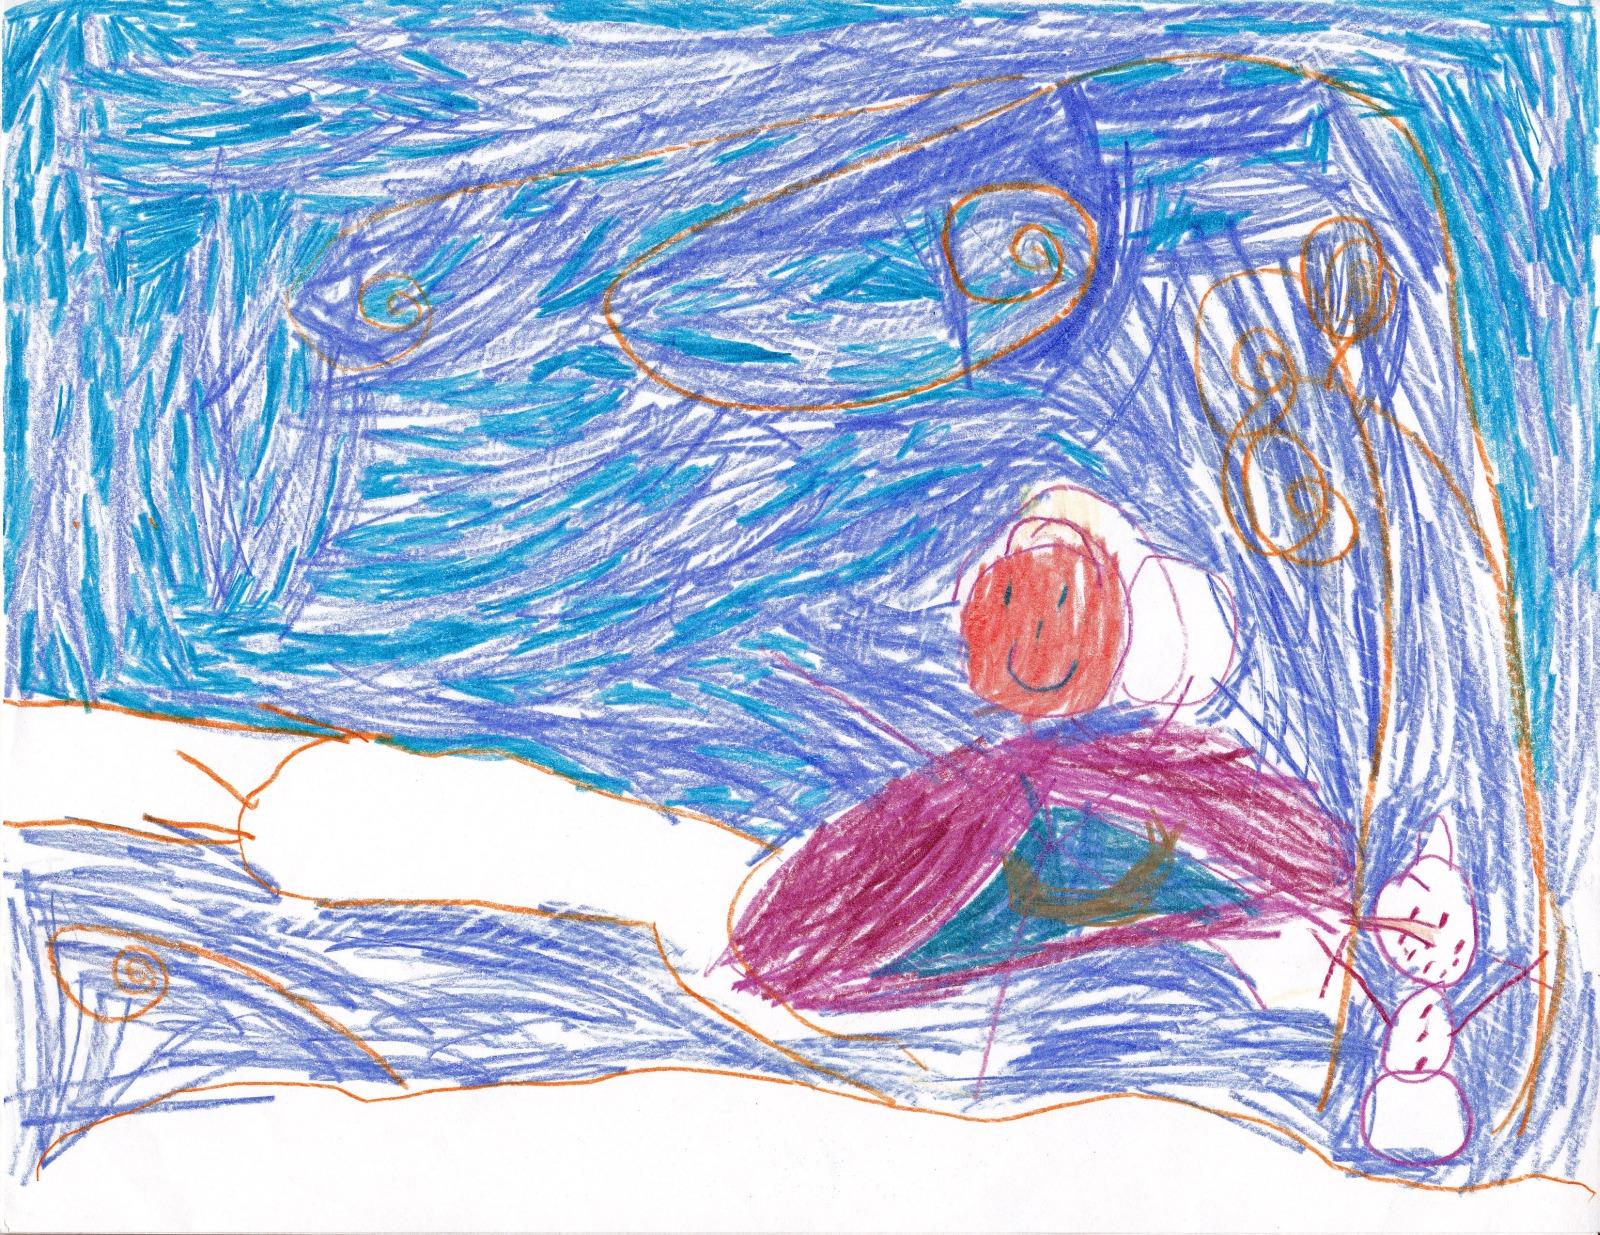 Frozen ‐ Anna's Best Friend, artwork by Amelia Gatzke